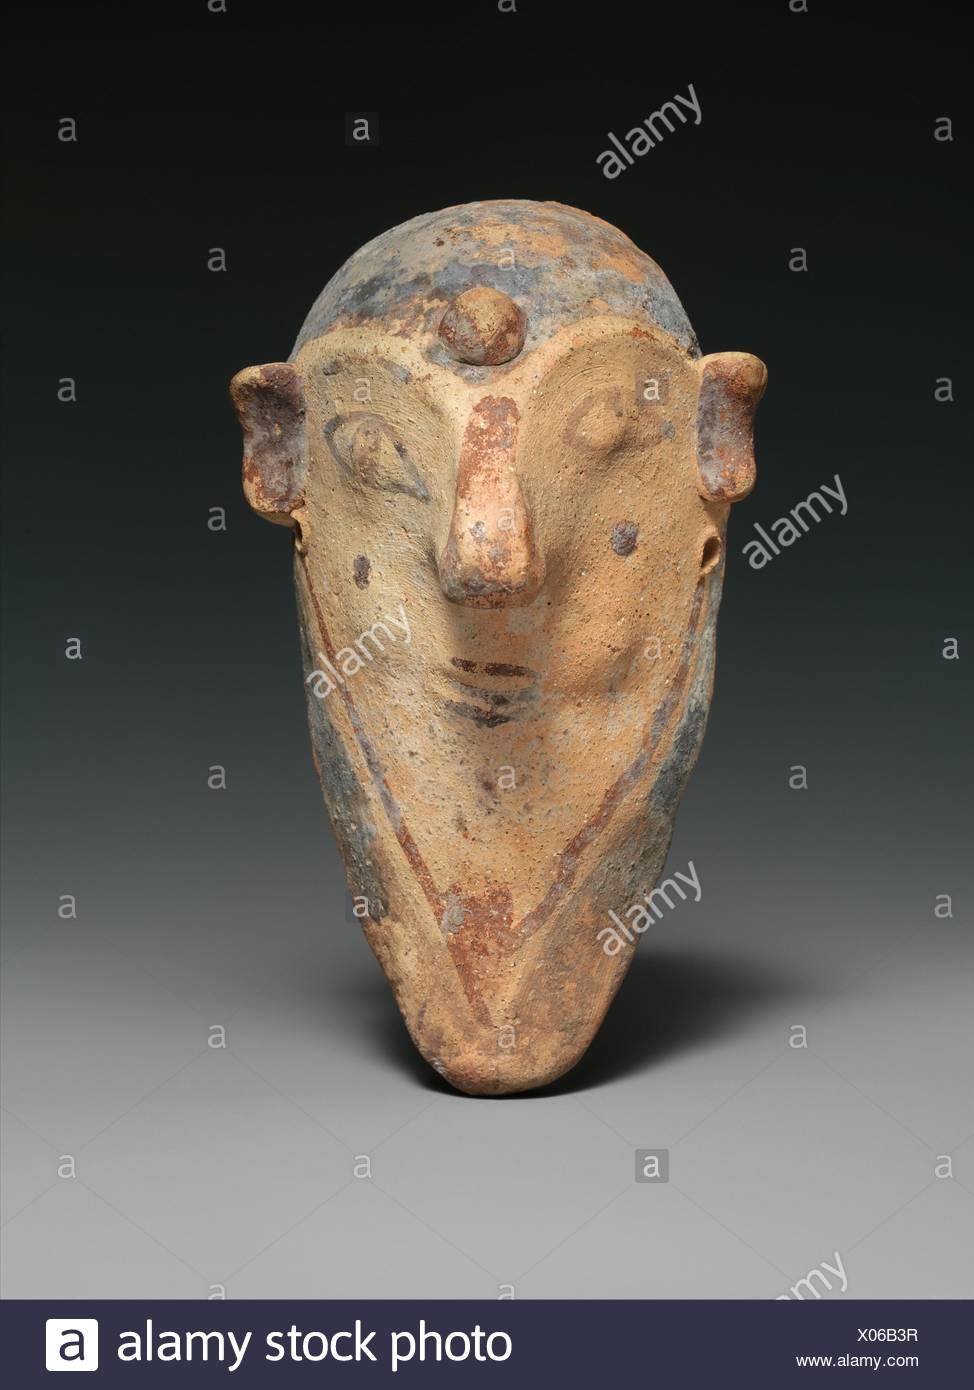 b01da9462e3a9 Masque en terre cuite d'un homme barbu. Période : Cypro-Archaic II